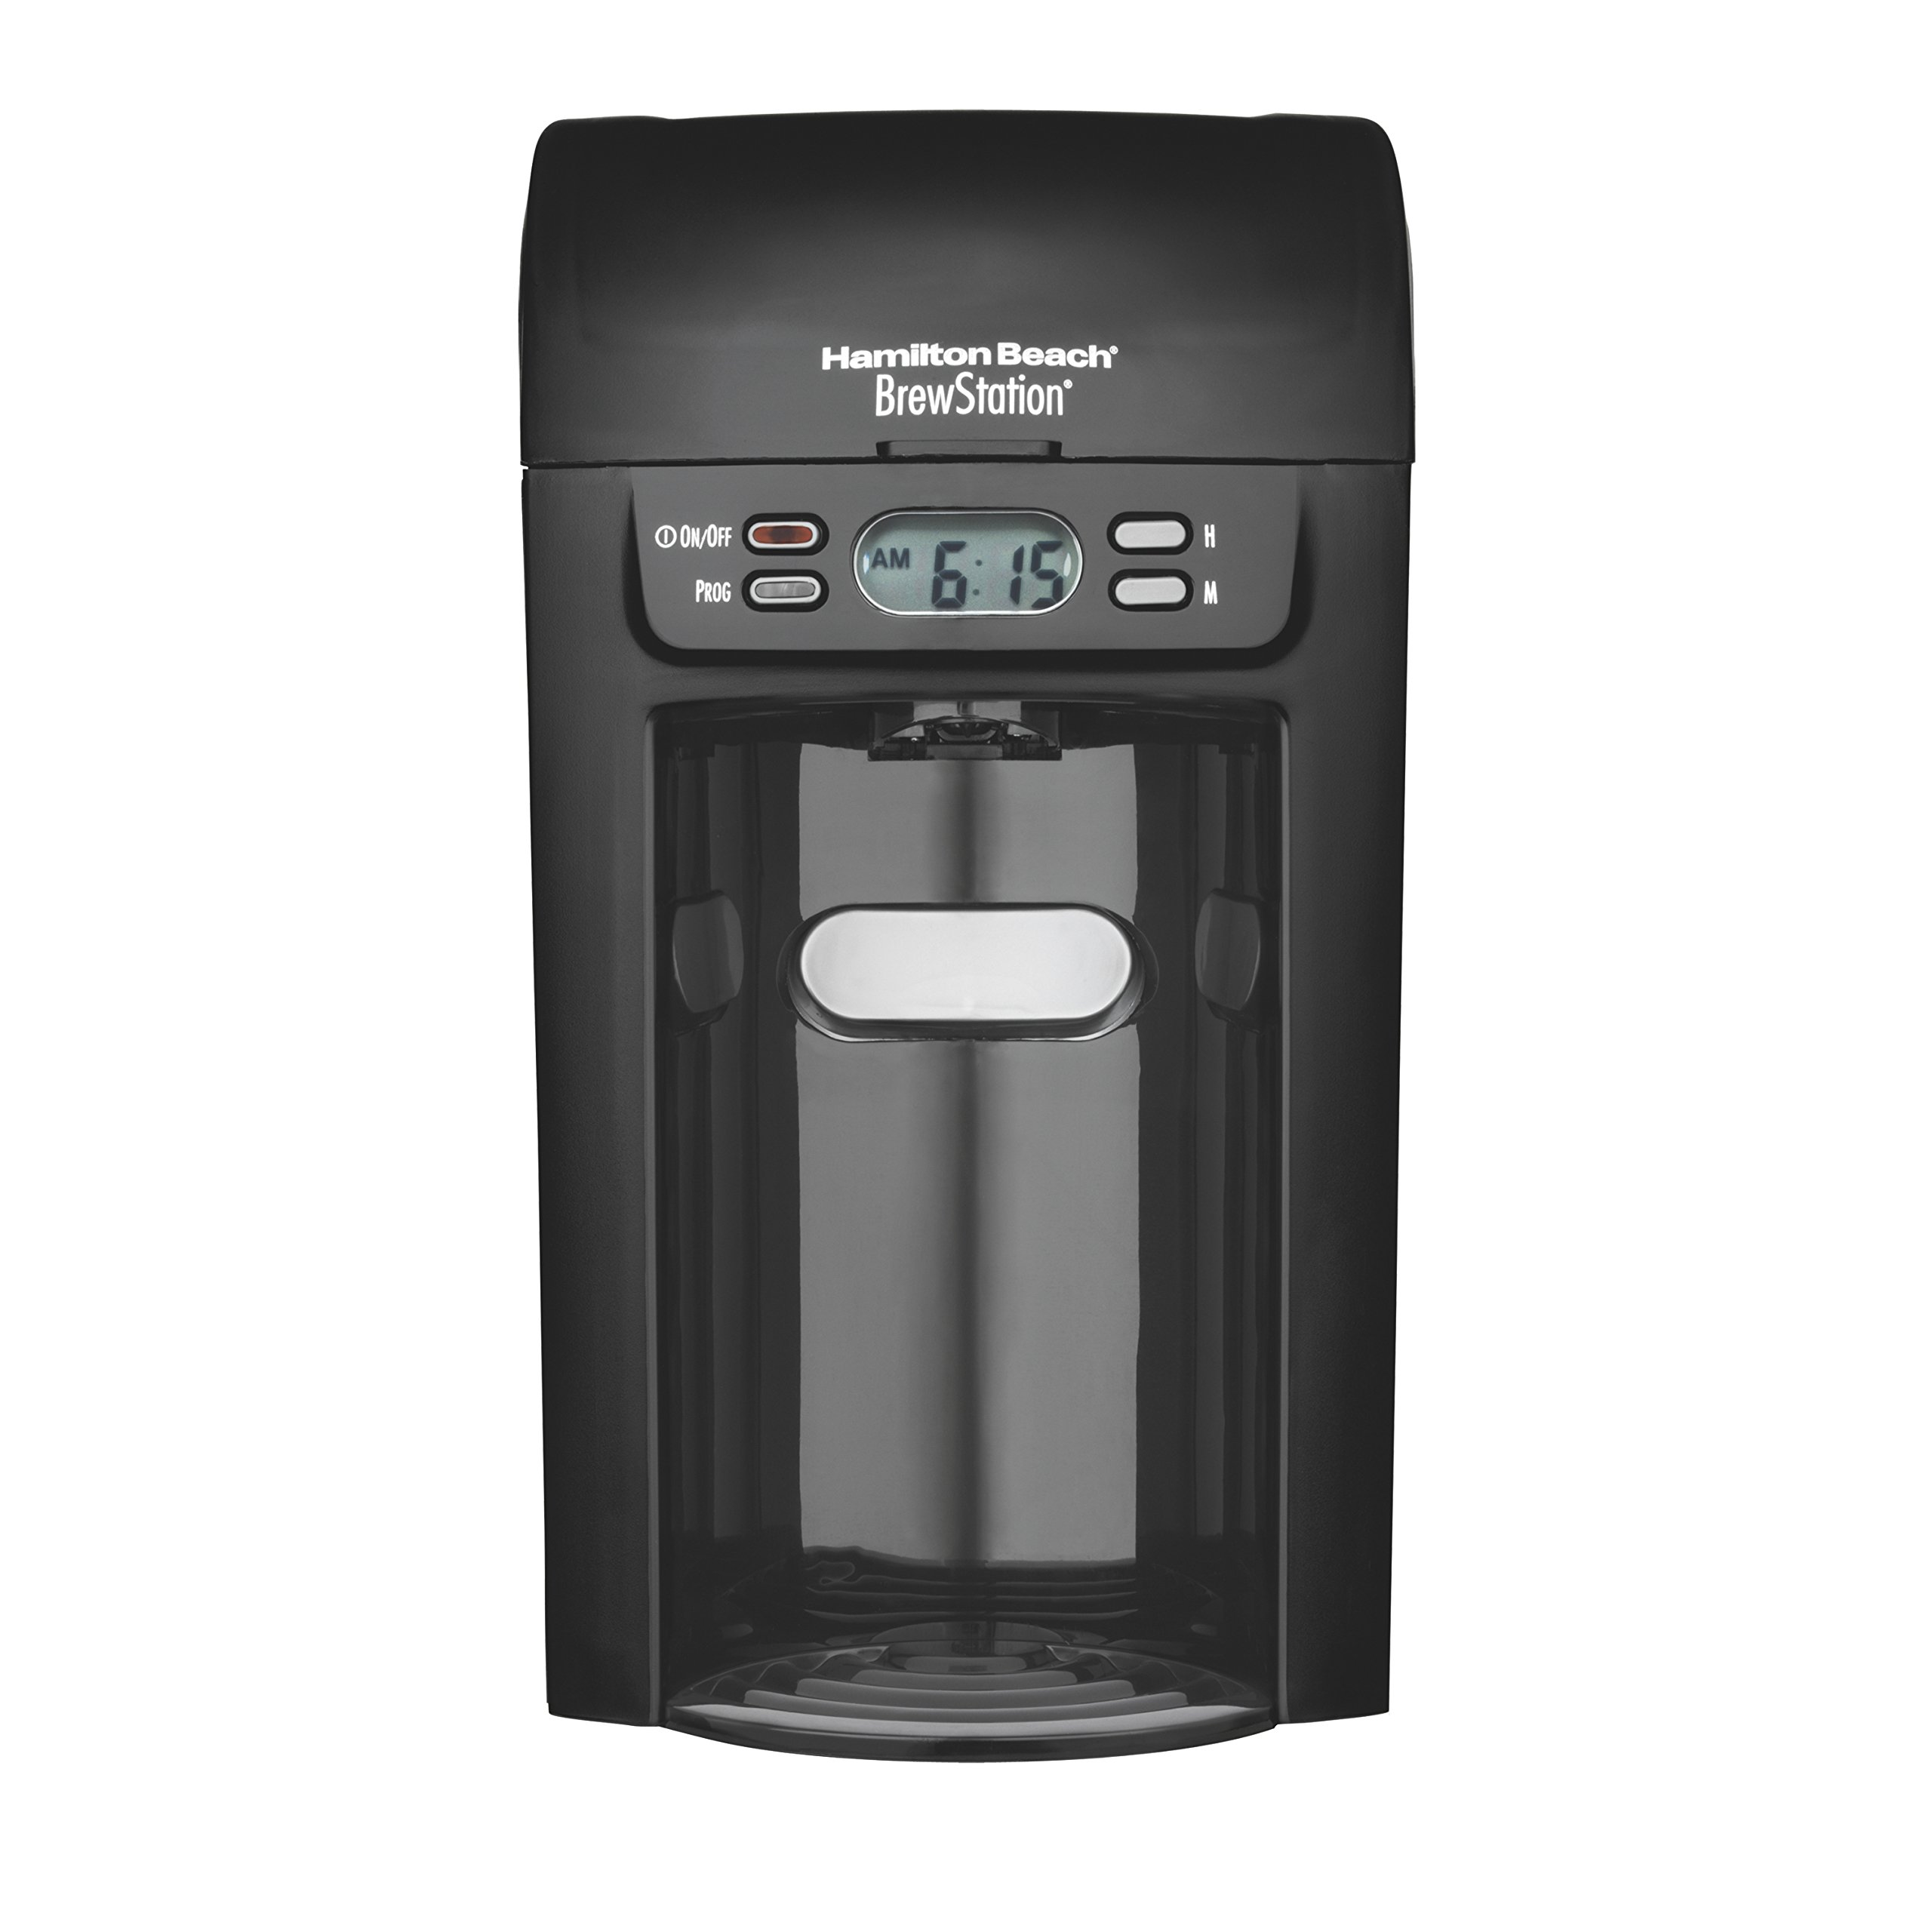 Hamilton Beach 6-Cup Coffee Maker, Programmable Brewstation Dispensing Coffee Machine (48274) by Hamilton Beach